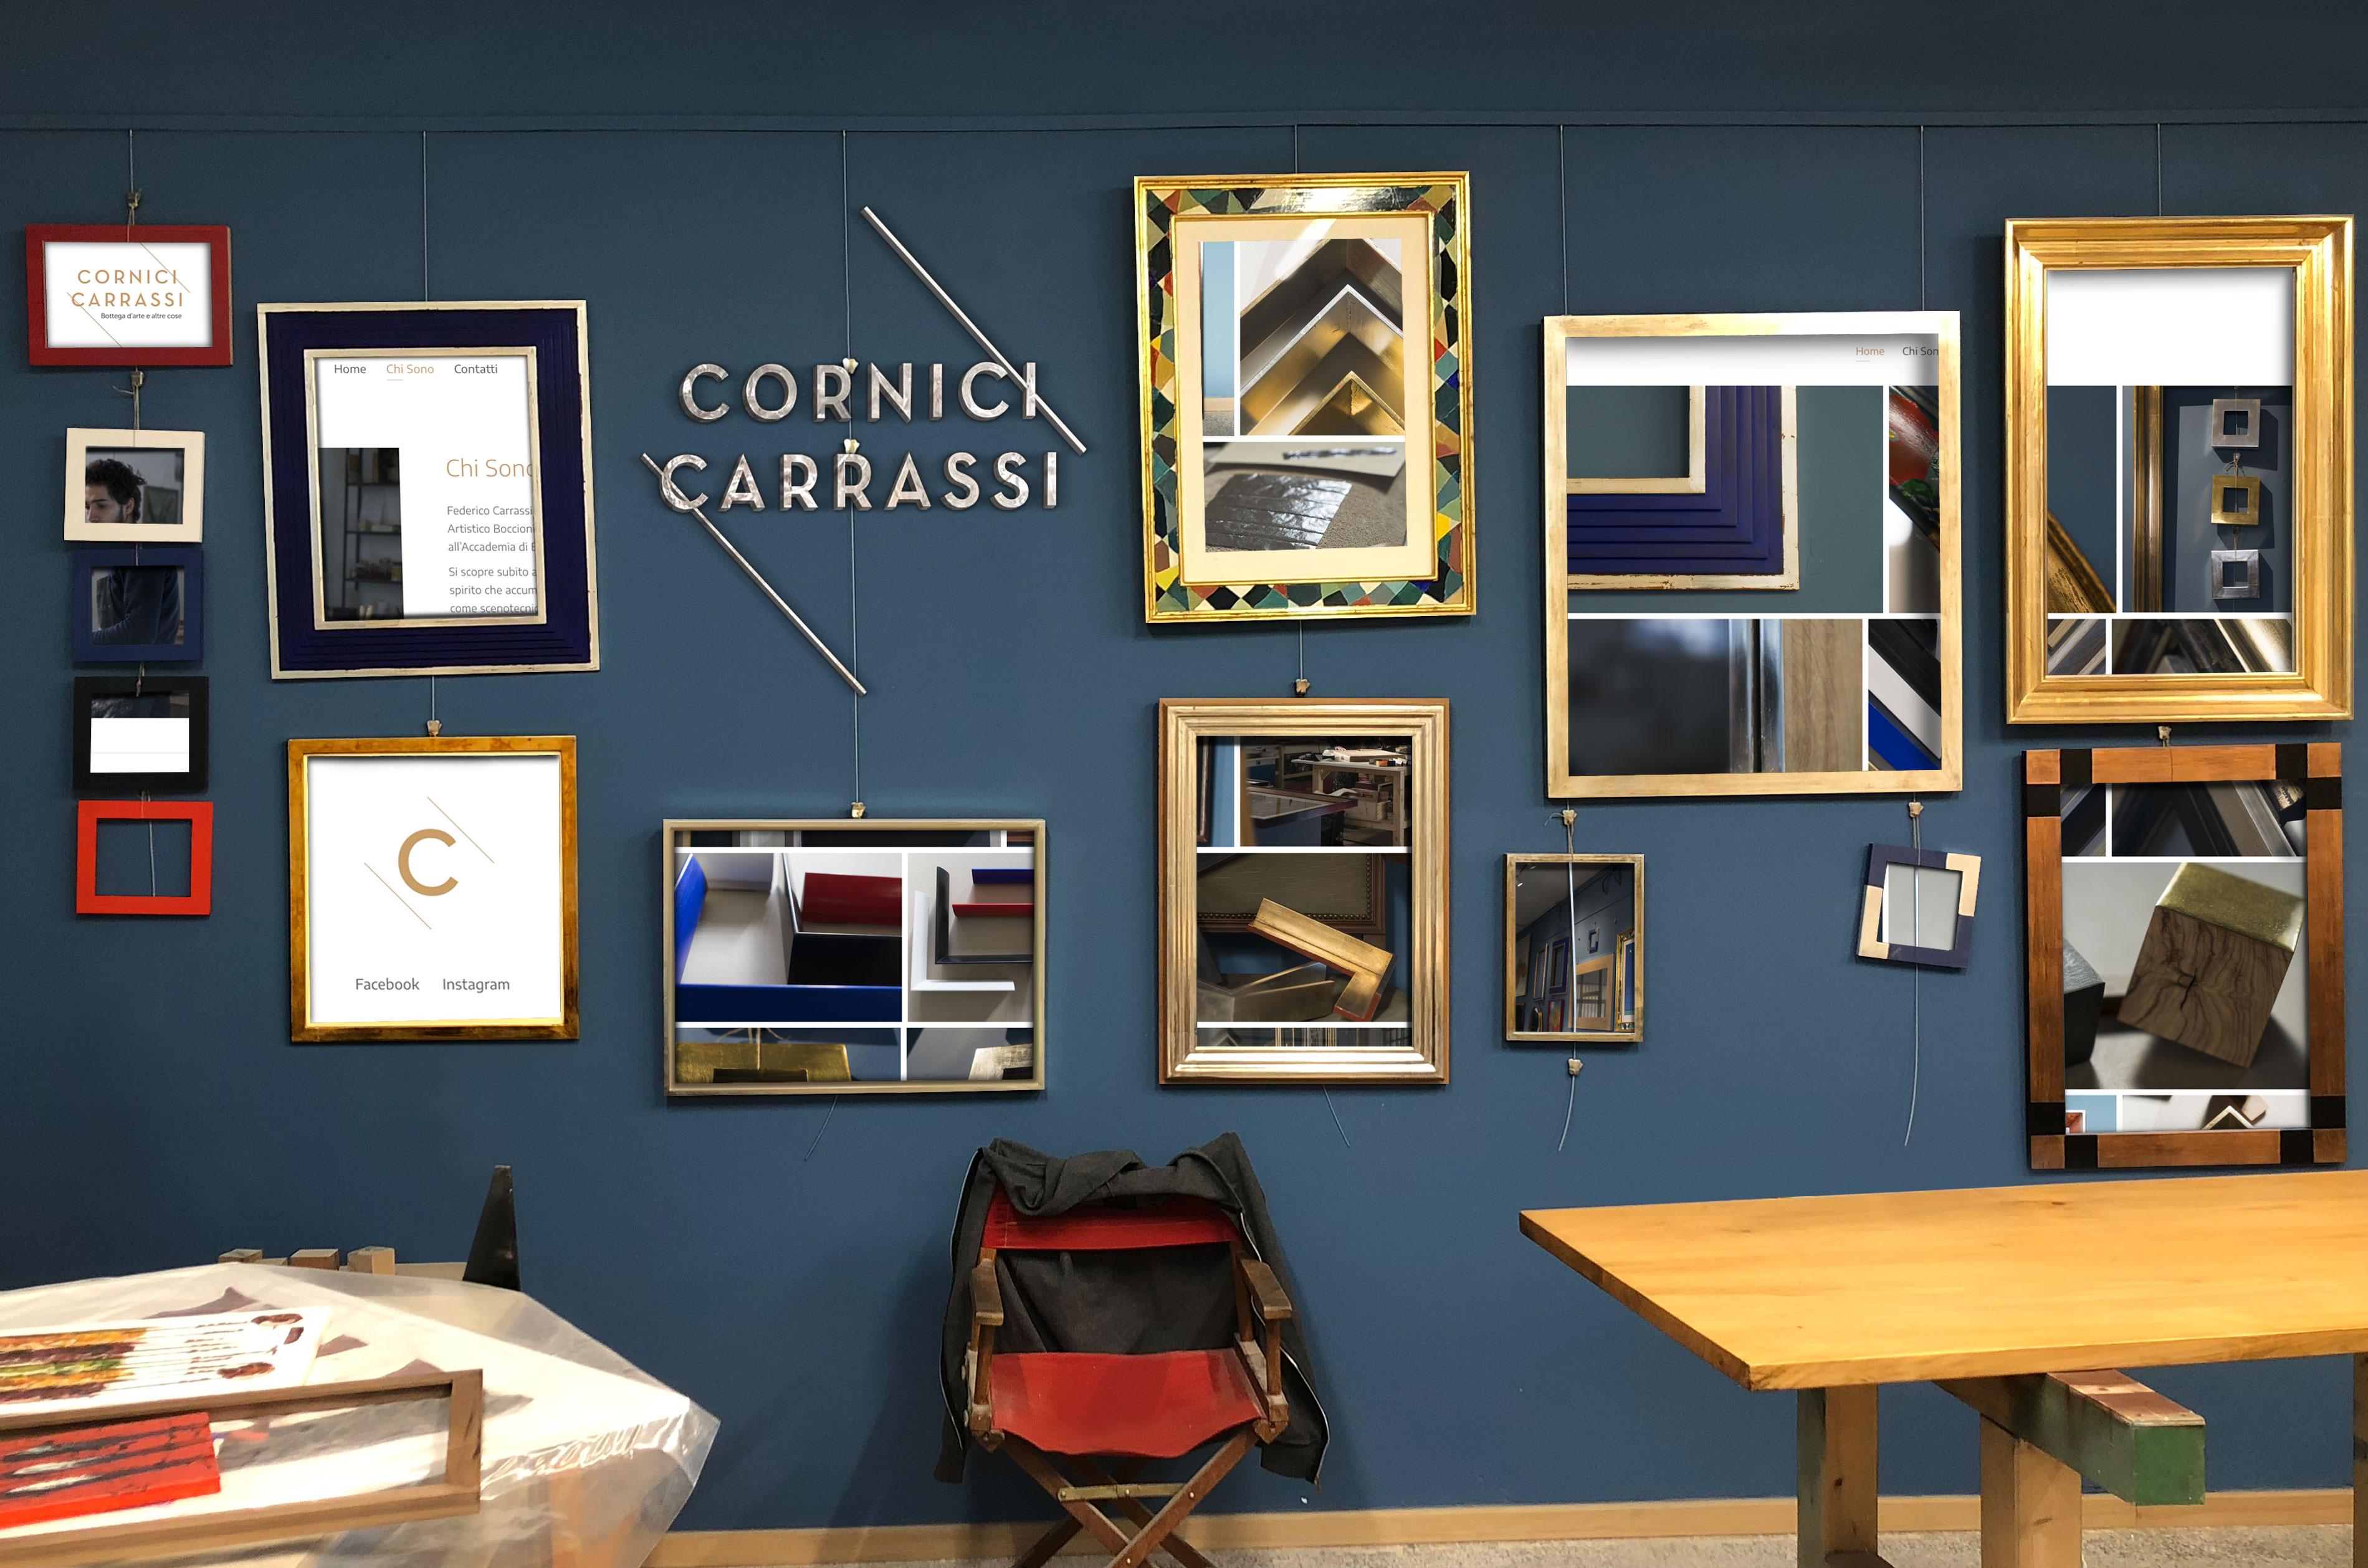 Cornici Carrassi